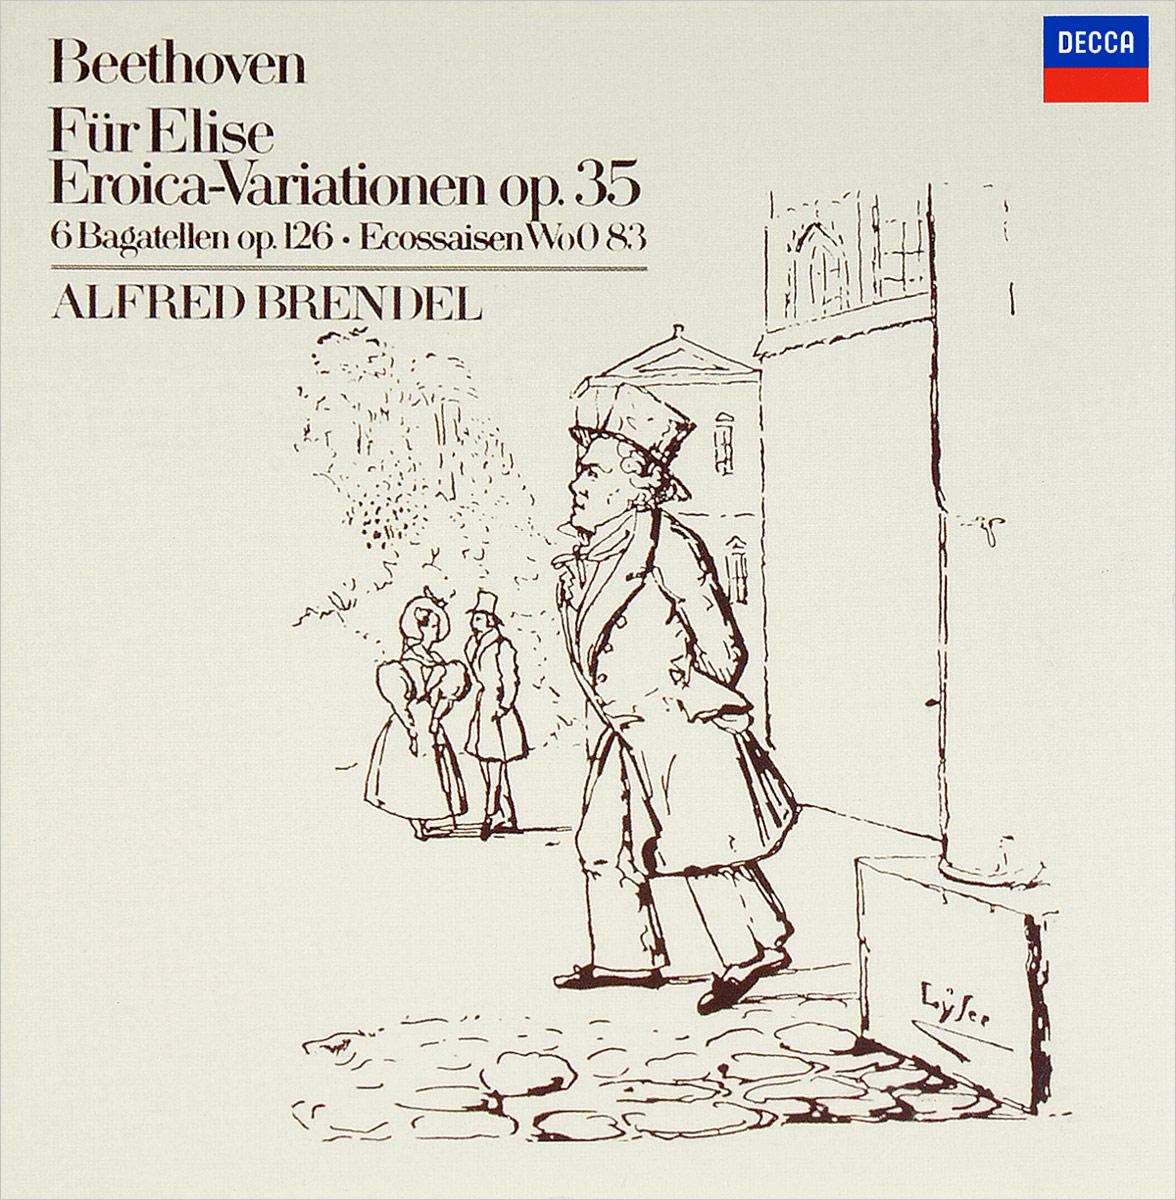 Альфред Брендель Alfred Brendel. Beethoven: Fur Elise; Eroica Variations, Op.35 анатоль угорский anatol ugorski beethoven sonate op 111 6 bagatellen op 126 fur elise